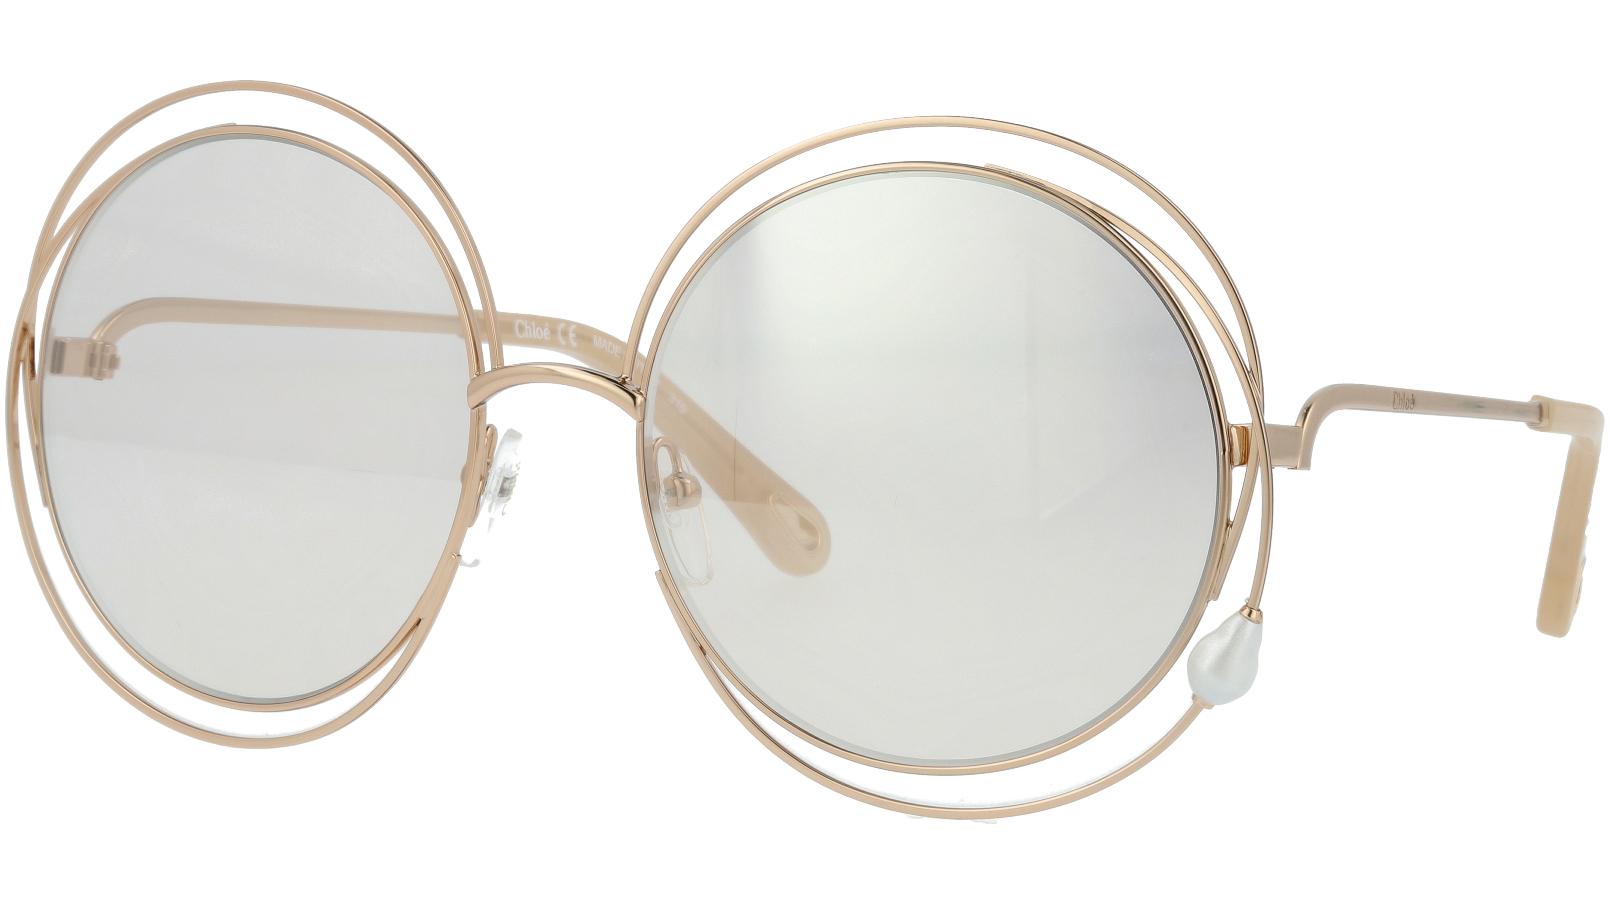 CHLOE CE114SPRL PEARL 857 58 ROSE Gold Round Carlina Sunglasses